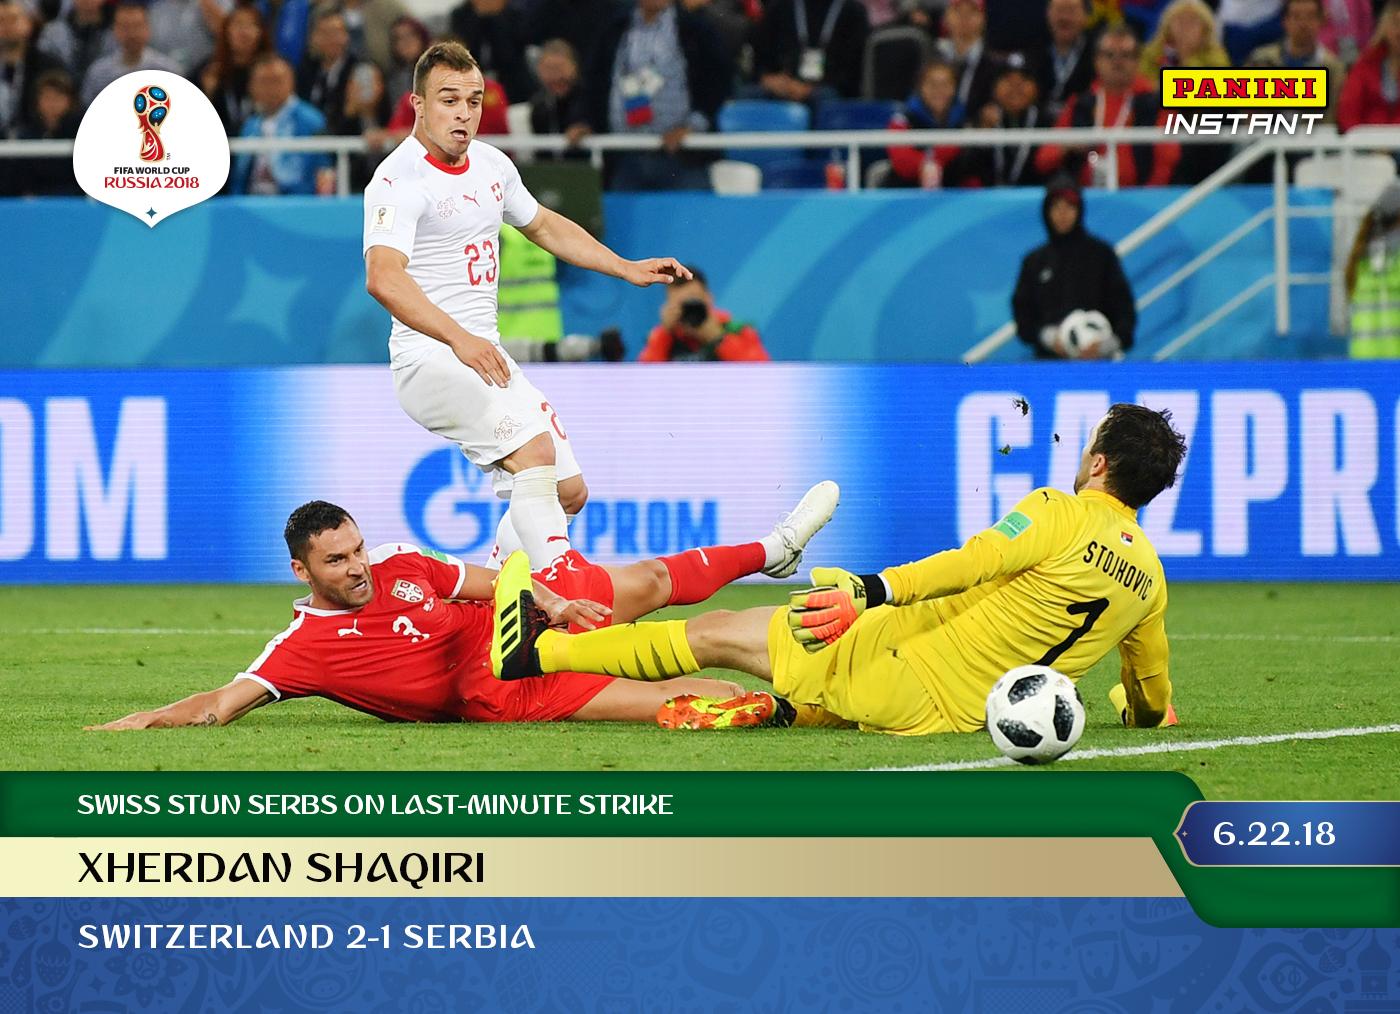 63e272254c0 Xherdan Shaqiri - 2018 Instant Soccer World Cup #55 – Green 1/10 – June 23